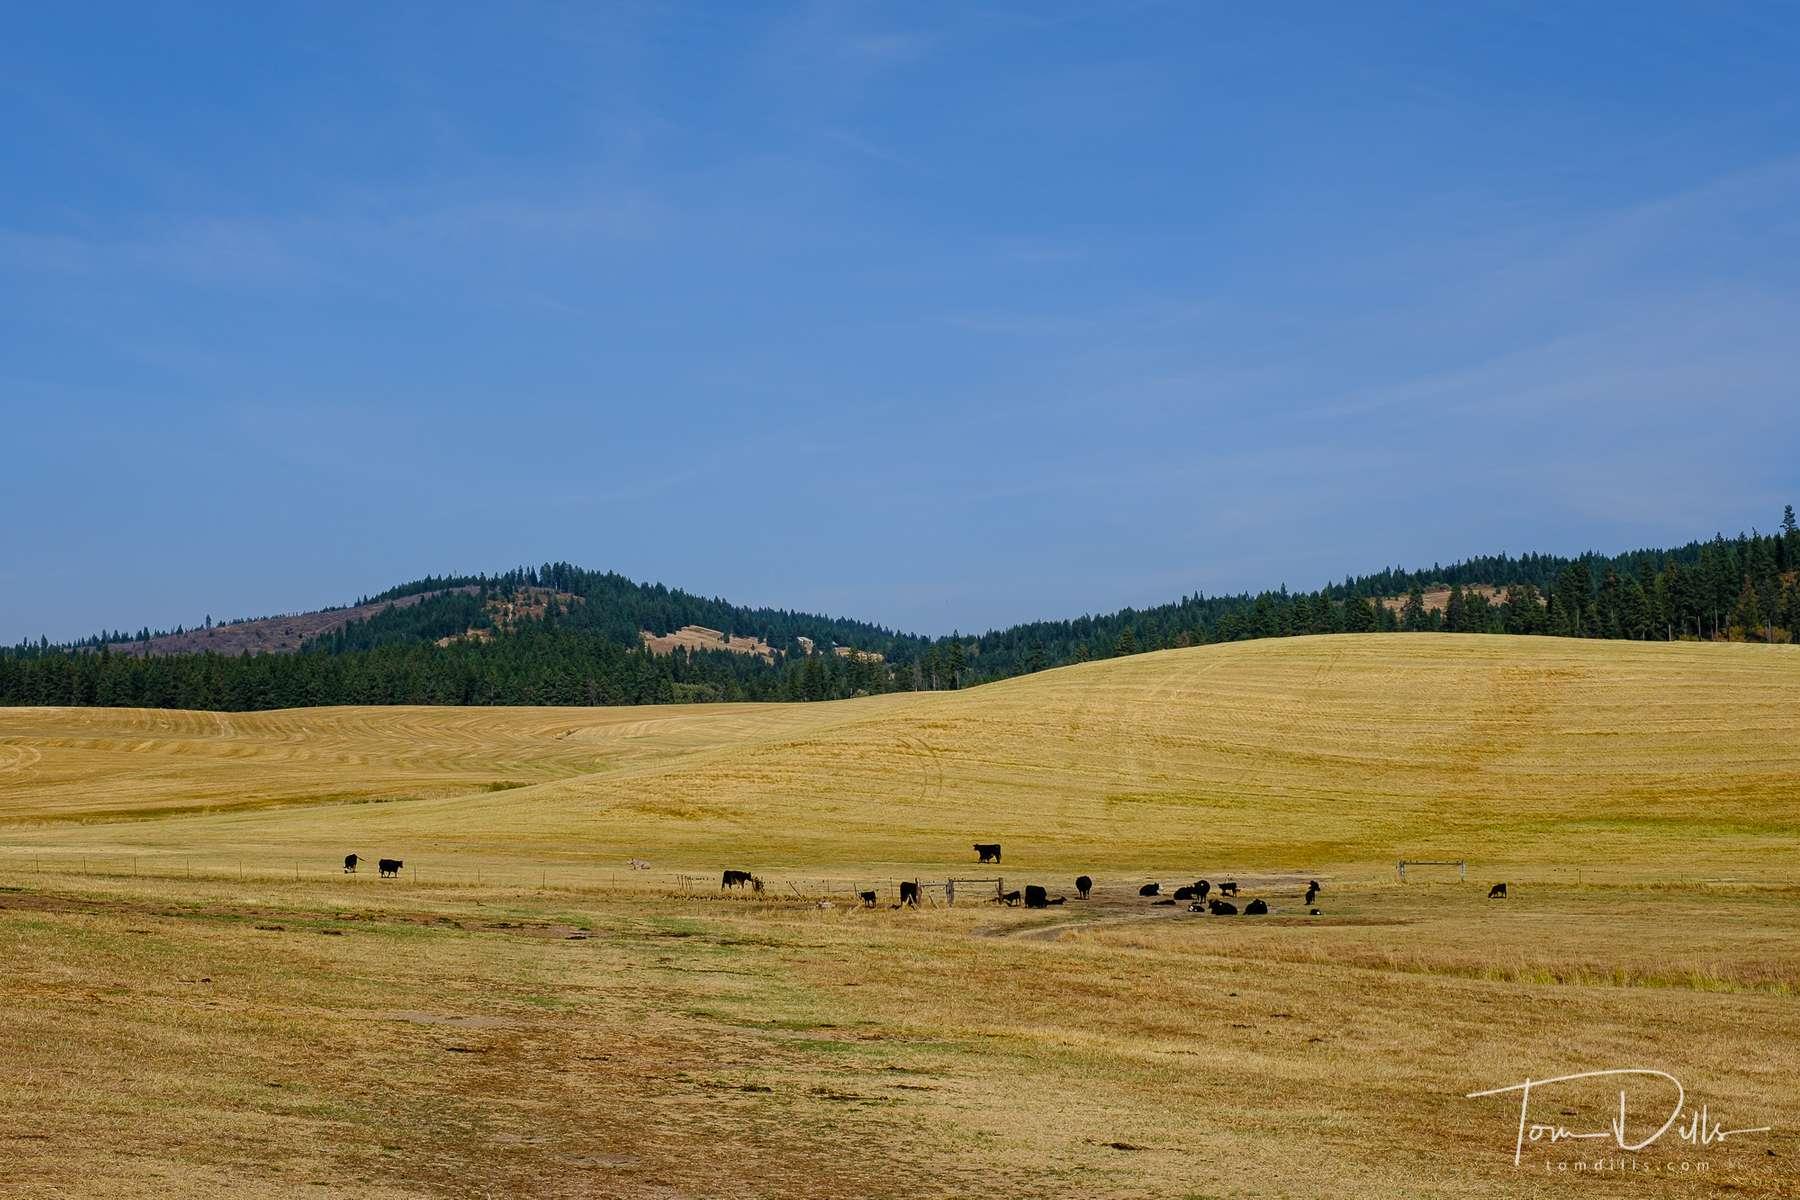 Rural countryside along US 95 in western Idaho